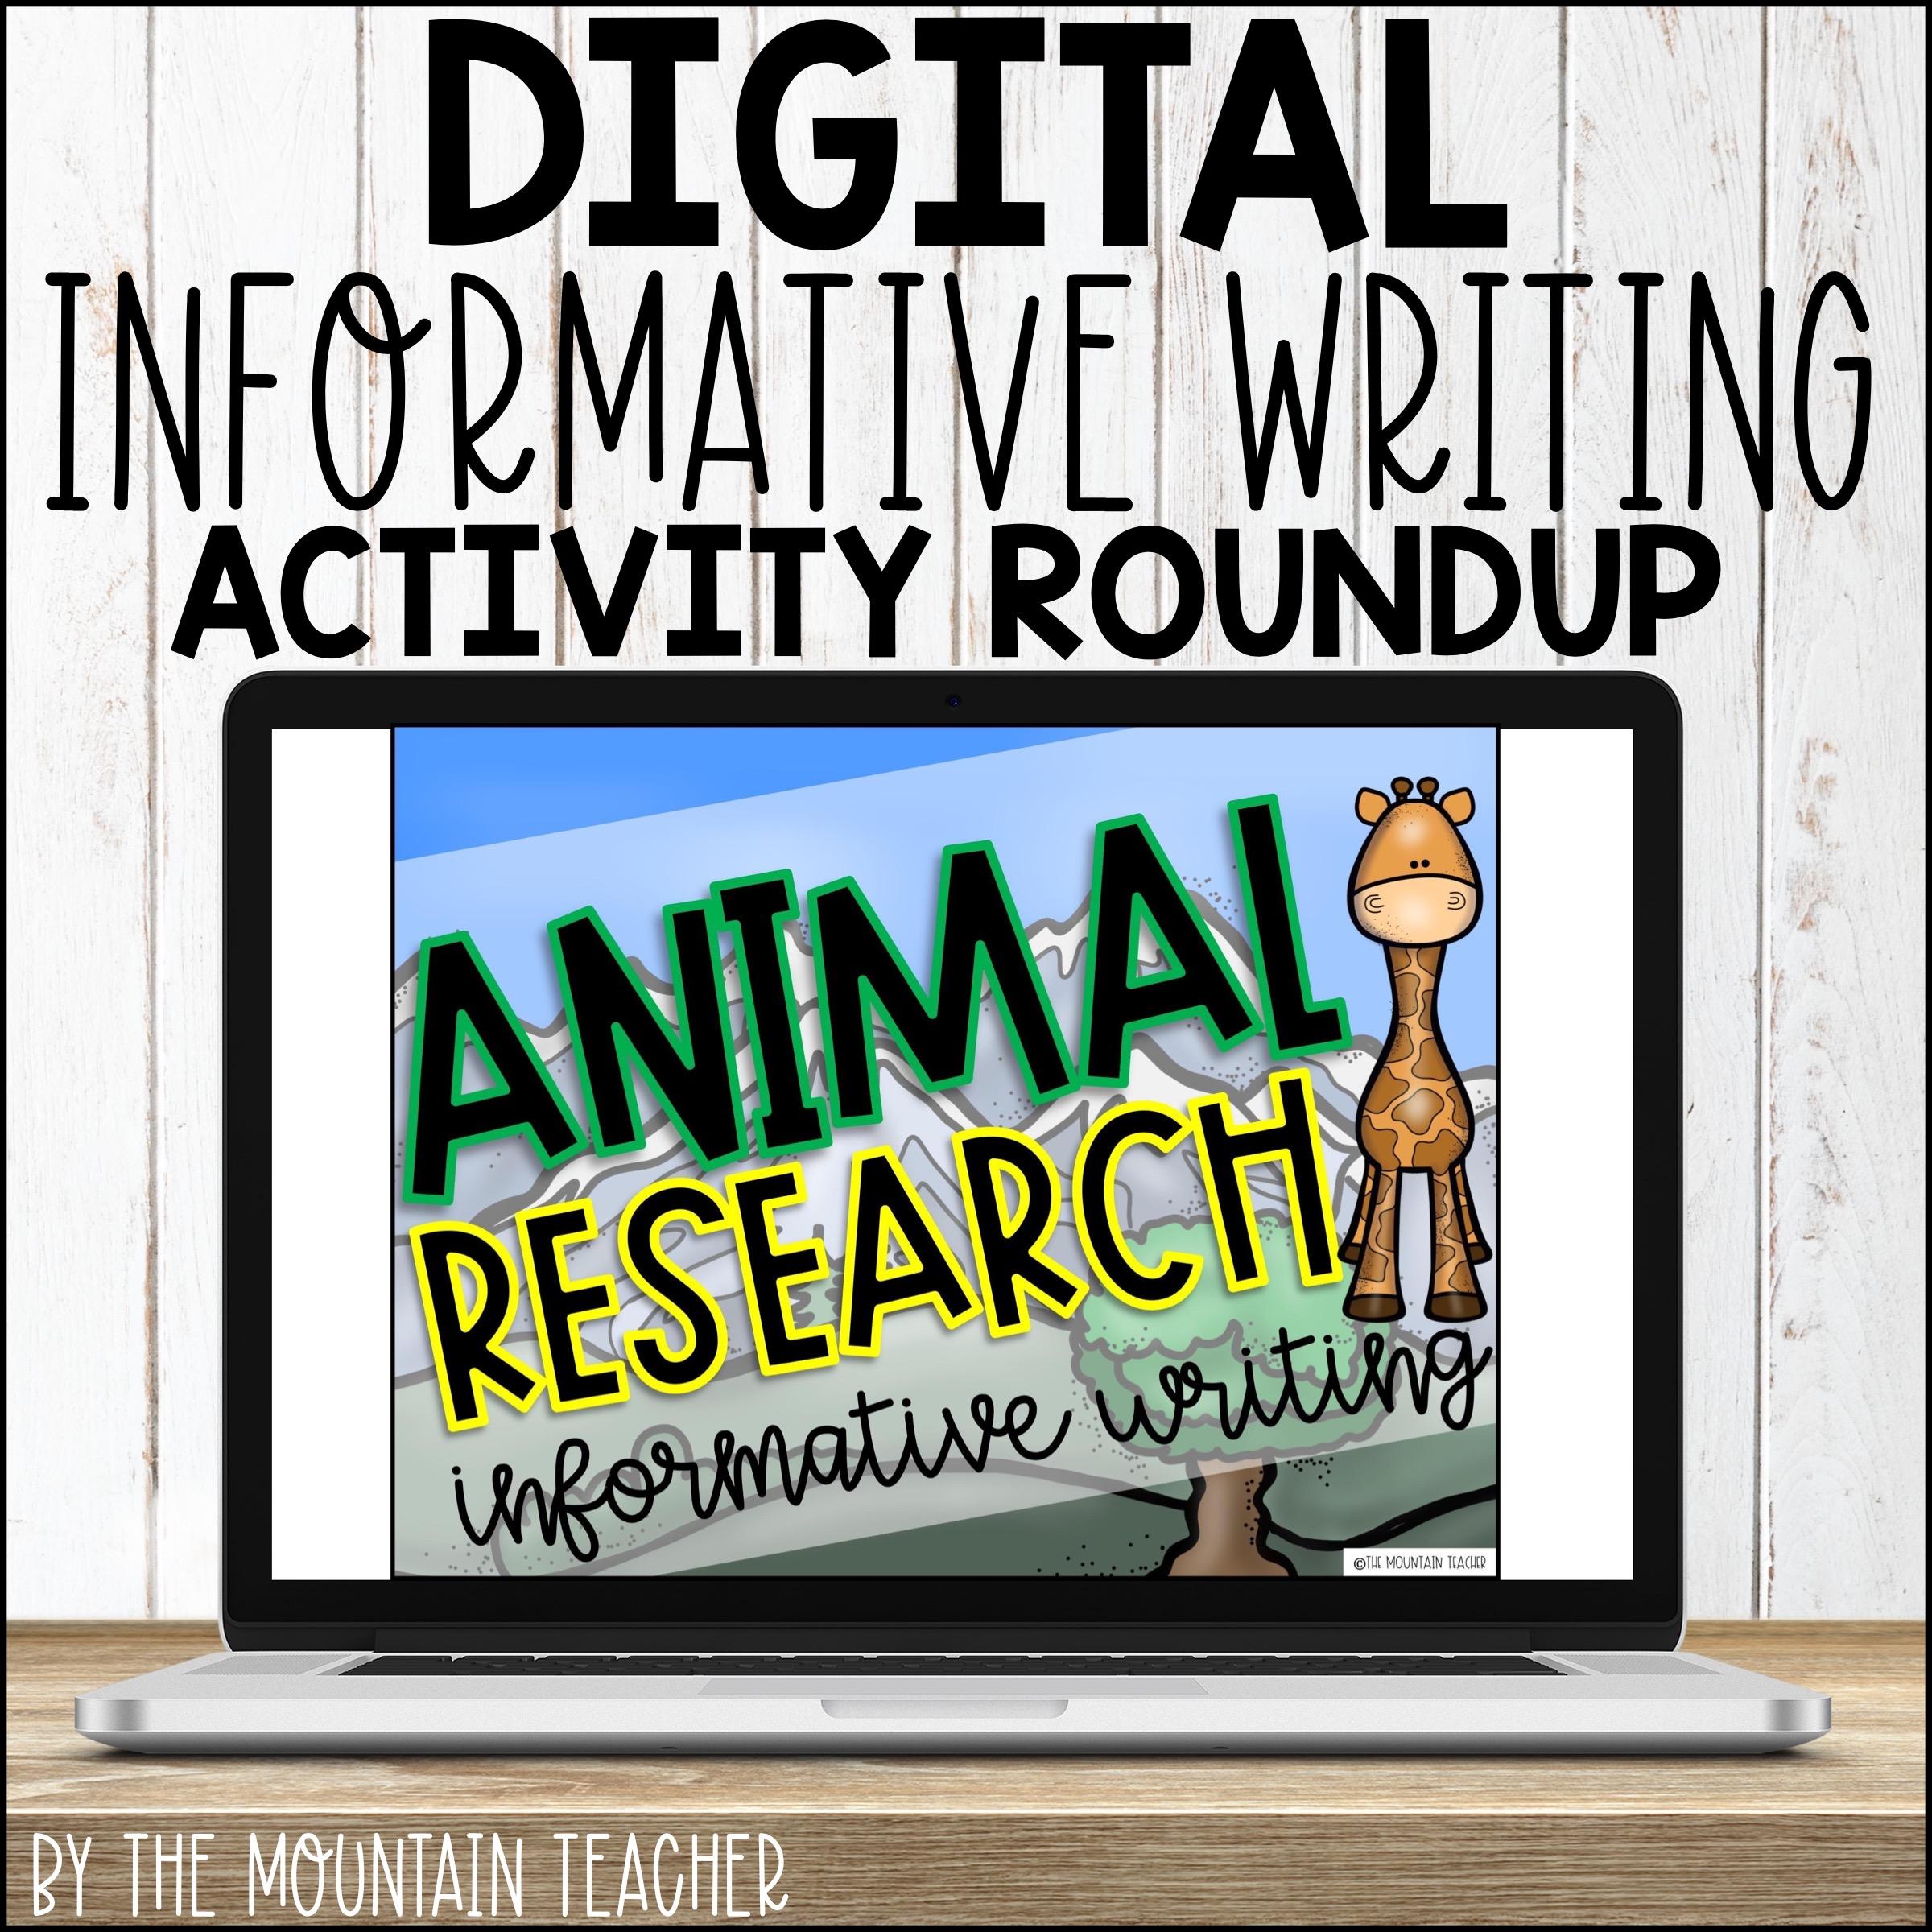 DIGITAL Informative Writing Activity Roundup